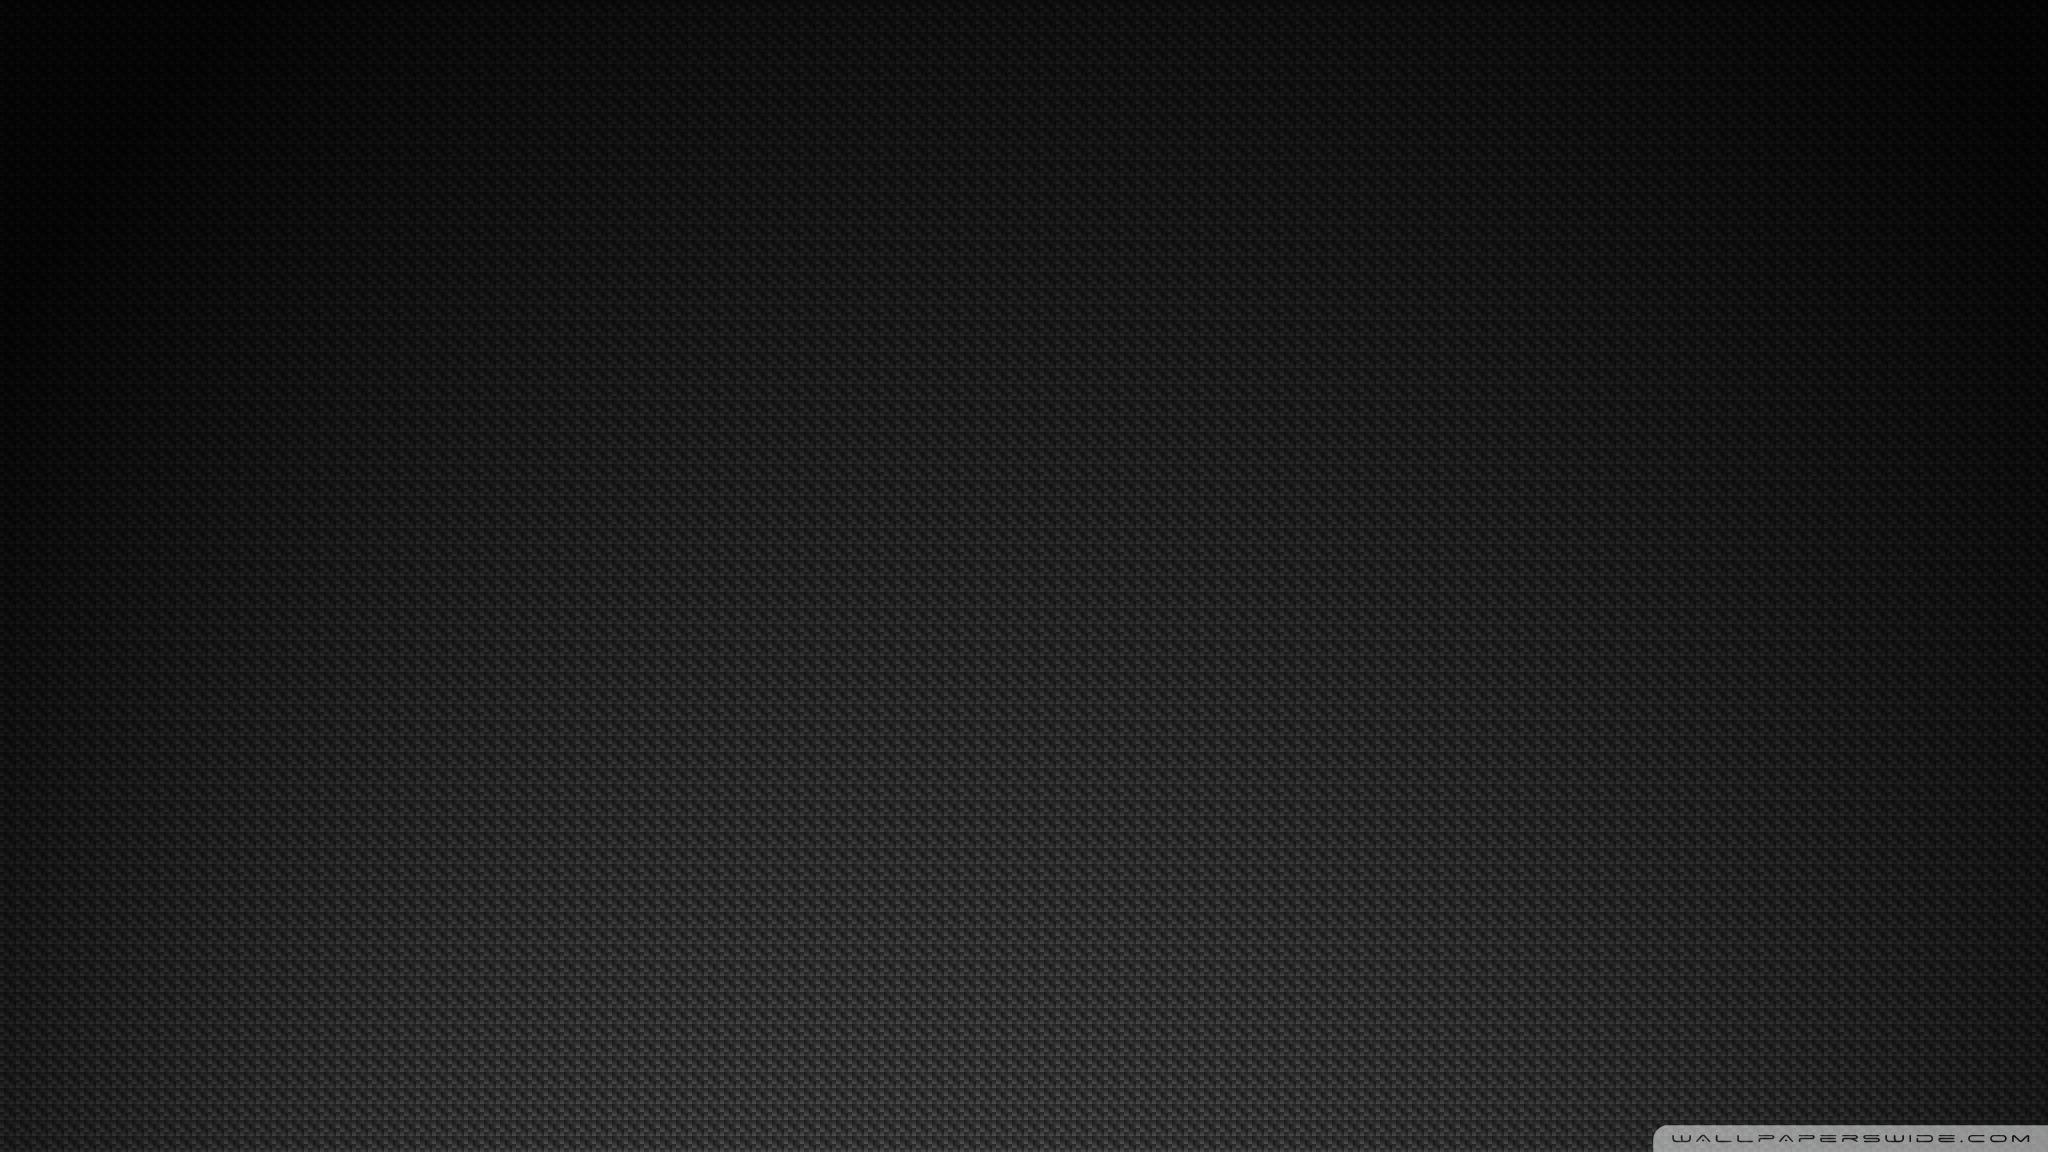 carbon fiber background ❤ 4k hd desktop wallpaper for 4k ultra hd